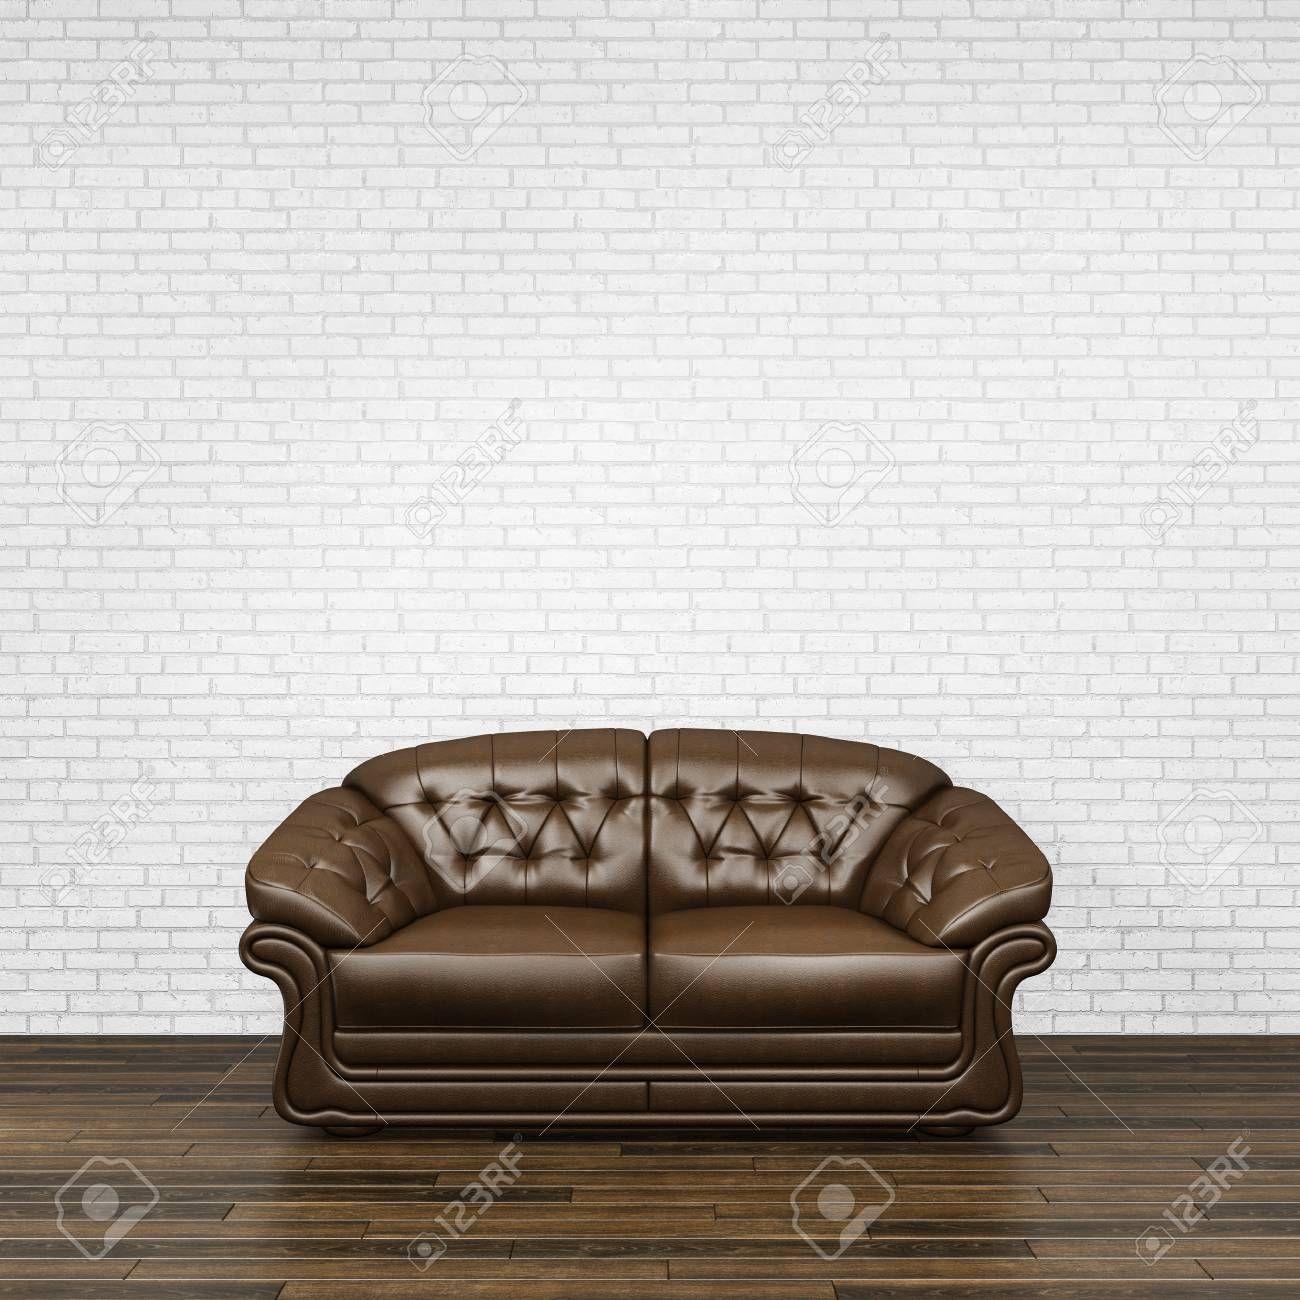 Dark Brown Leather Sofa Standing On Wooden Parquet Floor With ...